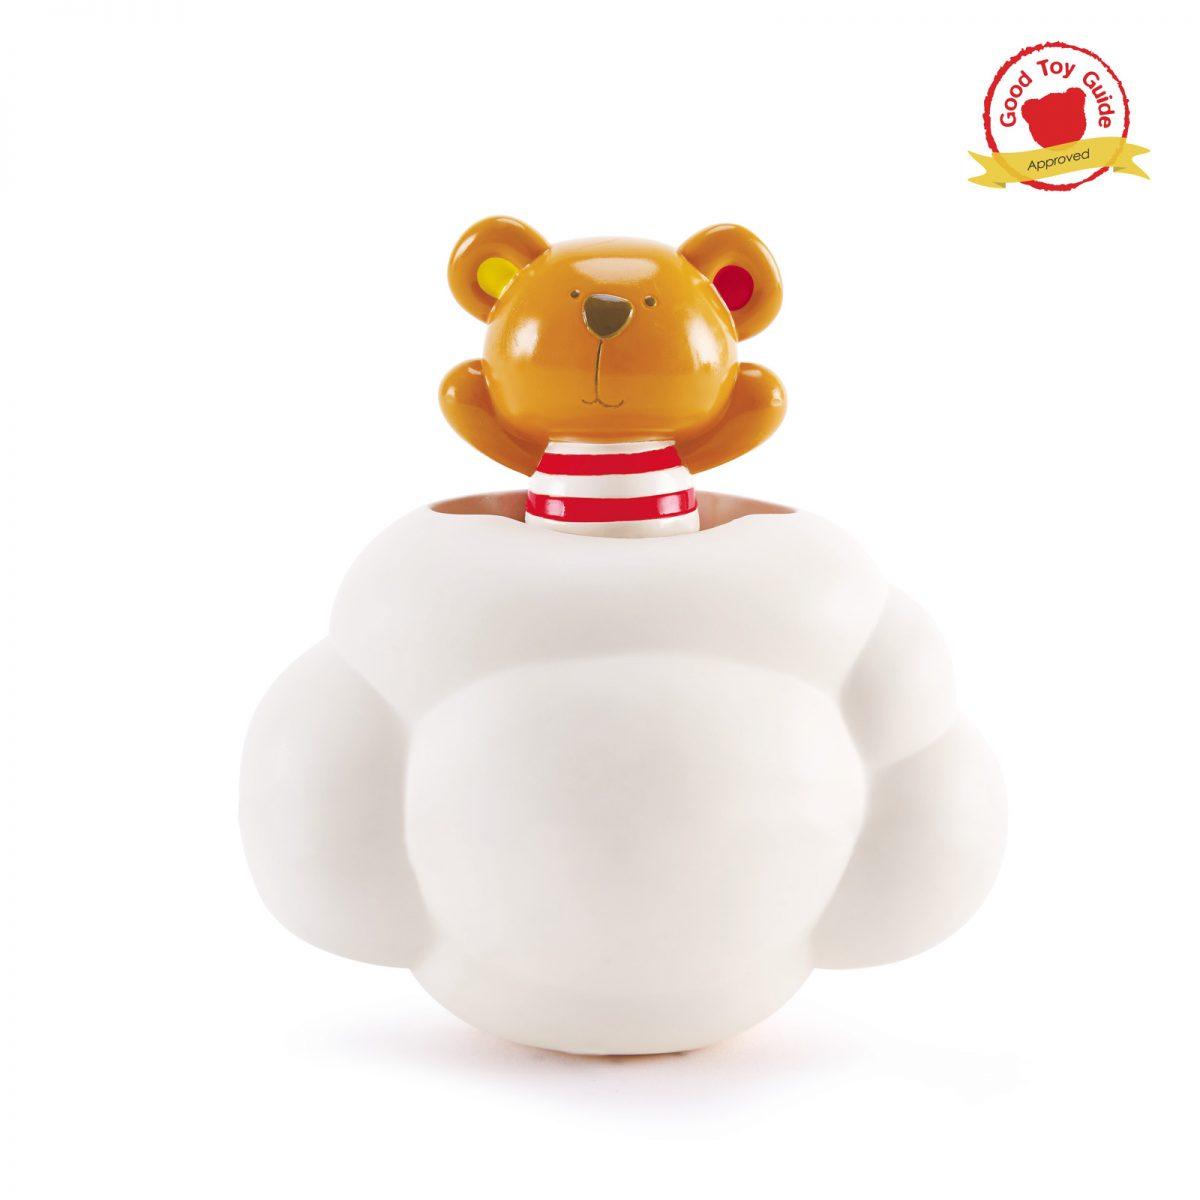 Pop-Up Teddy Shower Buddy – Hape